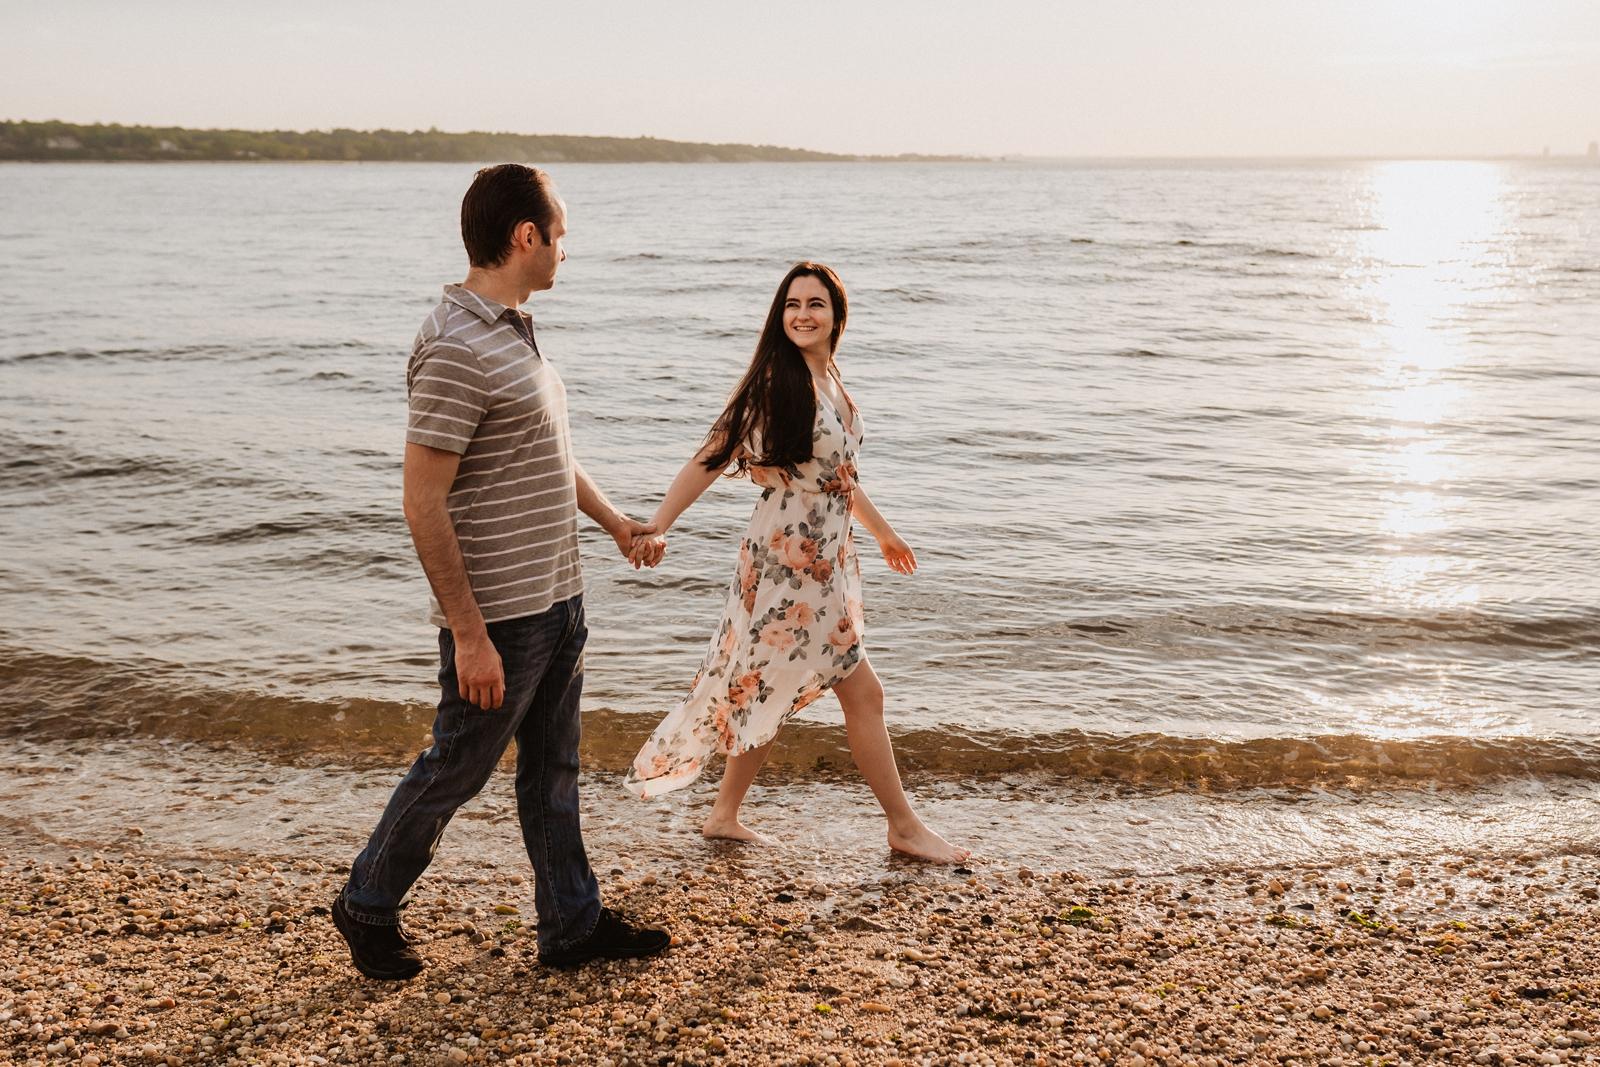 Ashley_James_Engagement_Morgan Park_Glen Cove_Sneak-May 20, 2019-9_blog.jpg